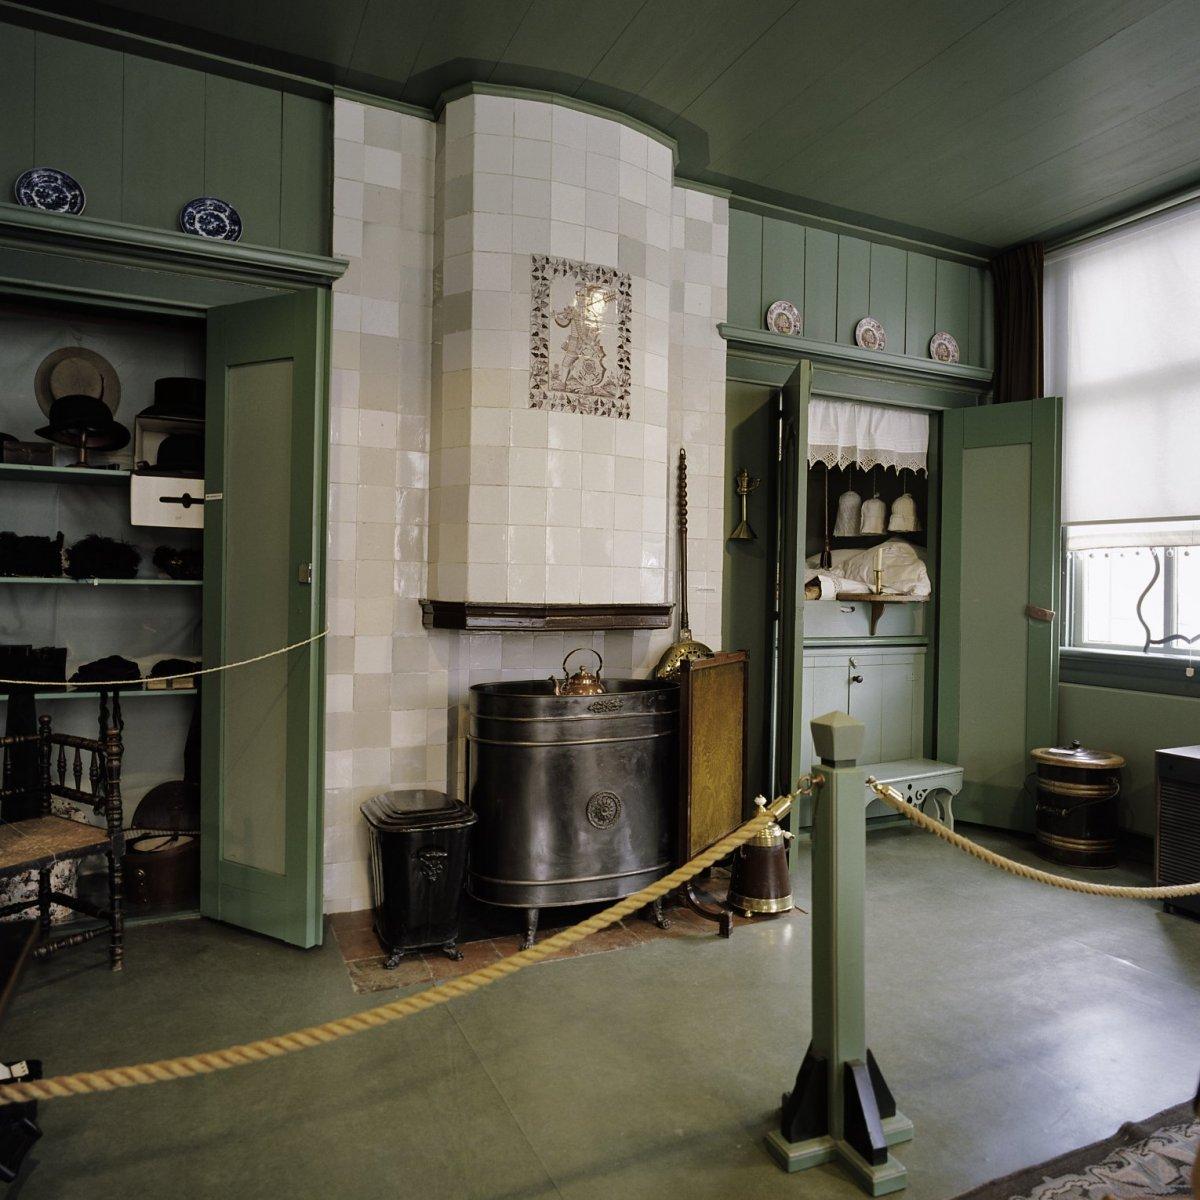 File interieur woonkamer met haardpartij schagen for Interieur woonkamer